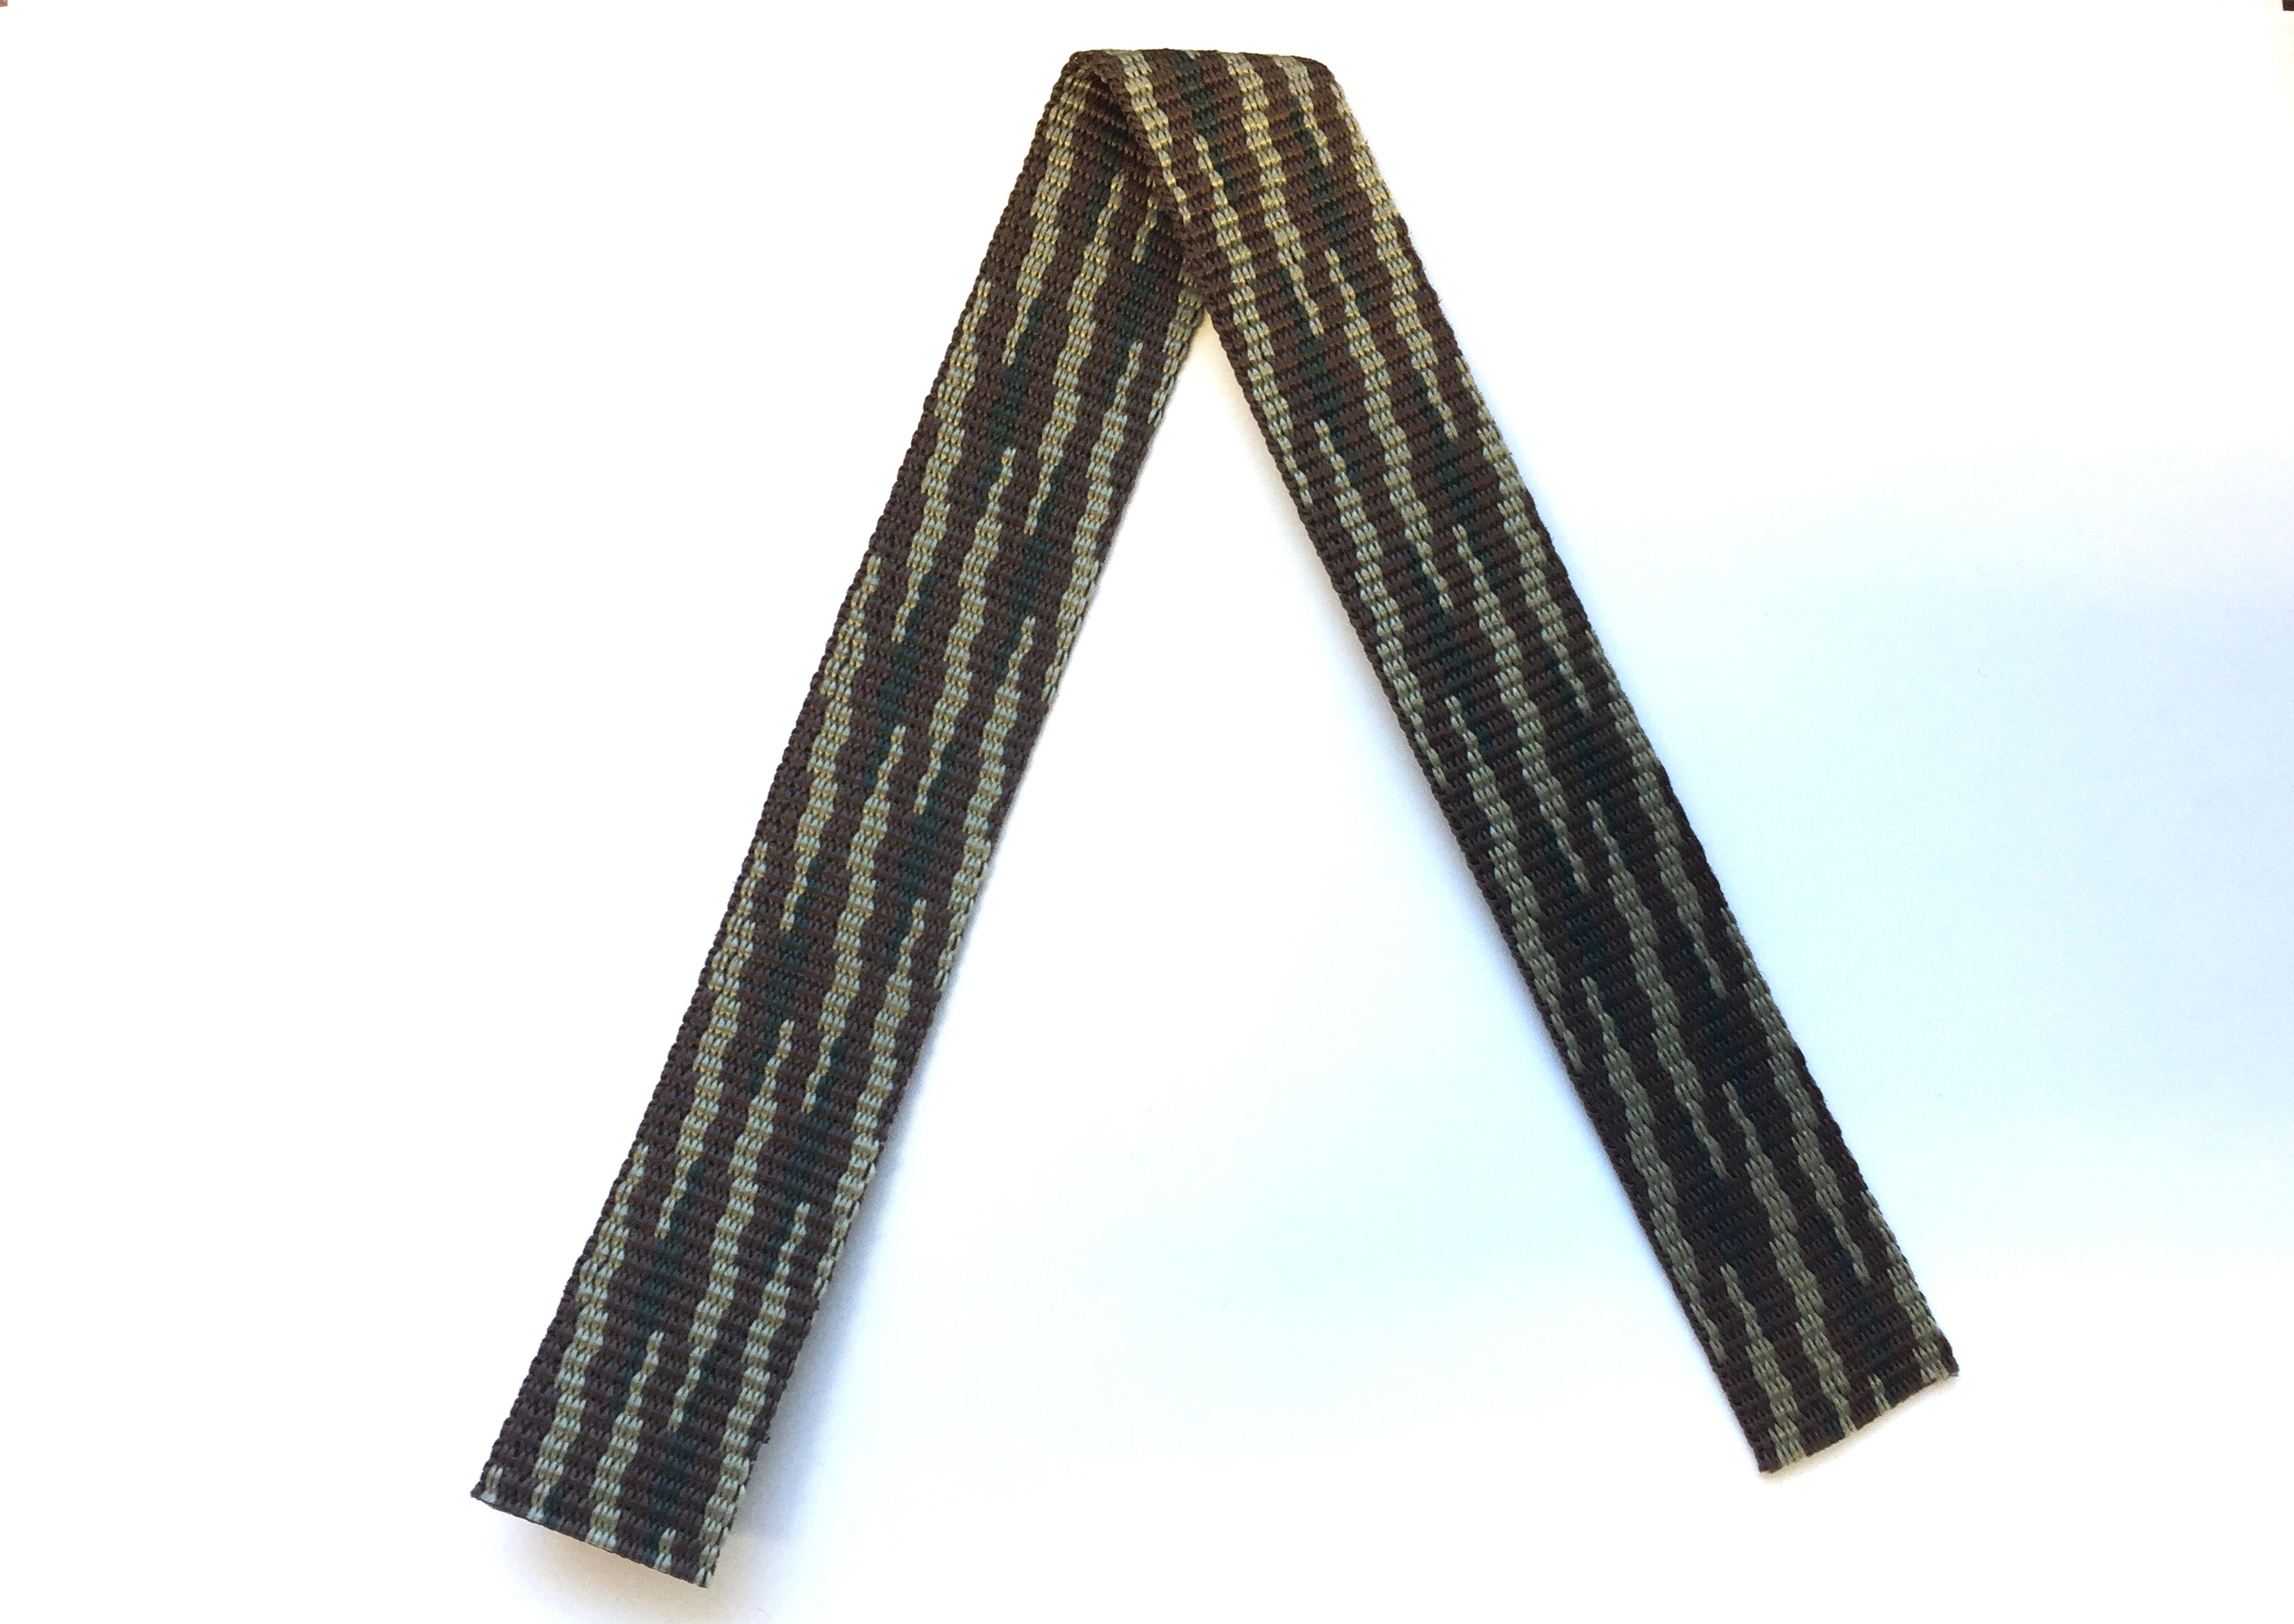 polypropylene-SU10284-1-inch-camo